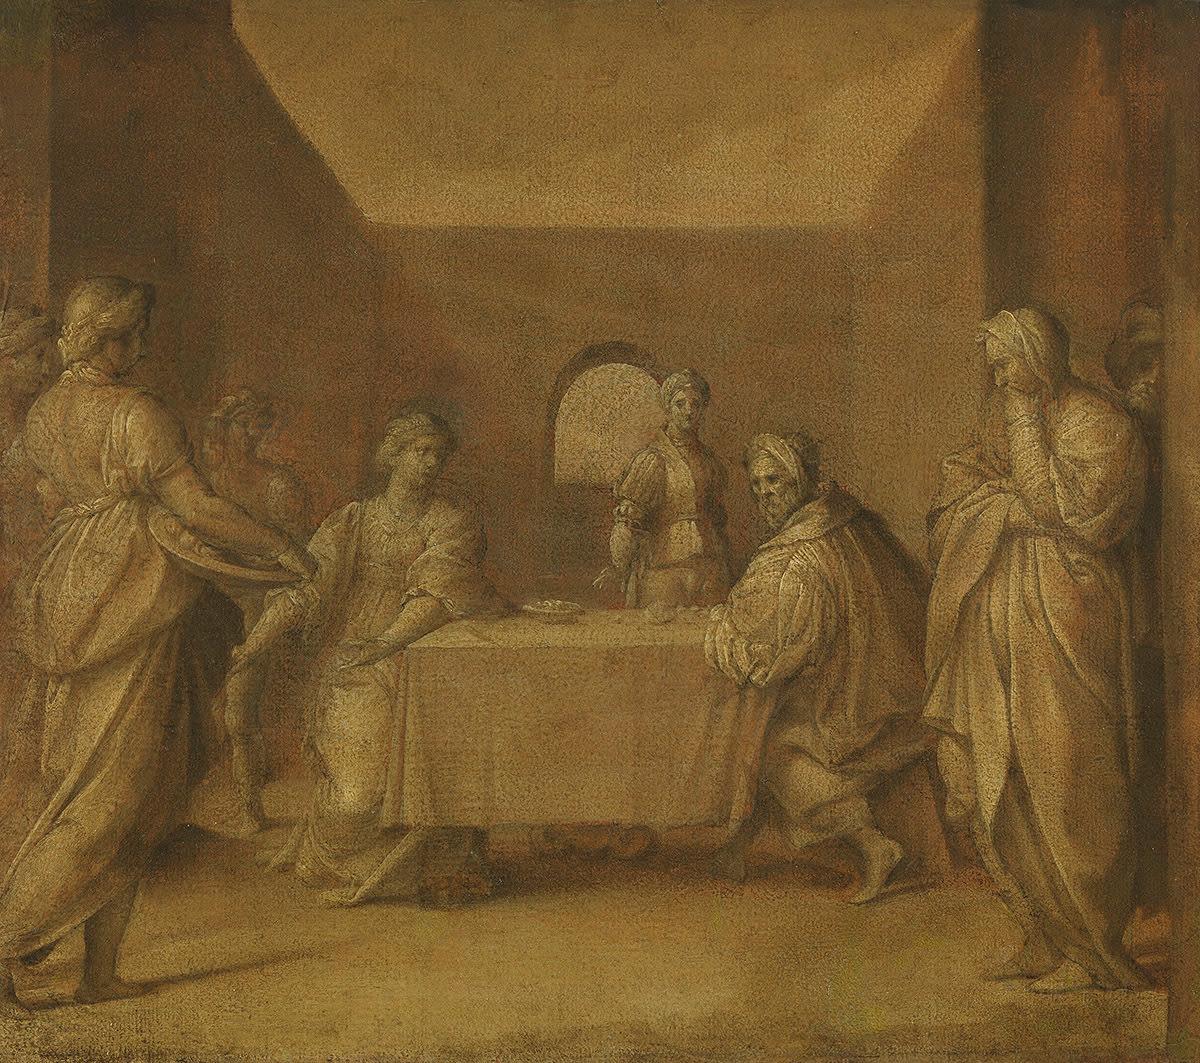 Salome mit dem Haupt Johannes' des Täufers